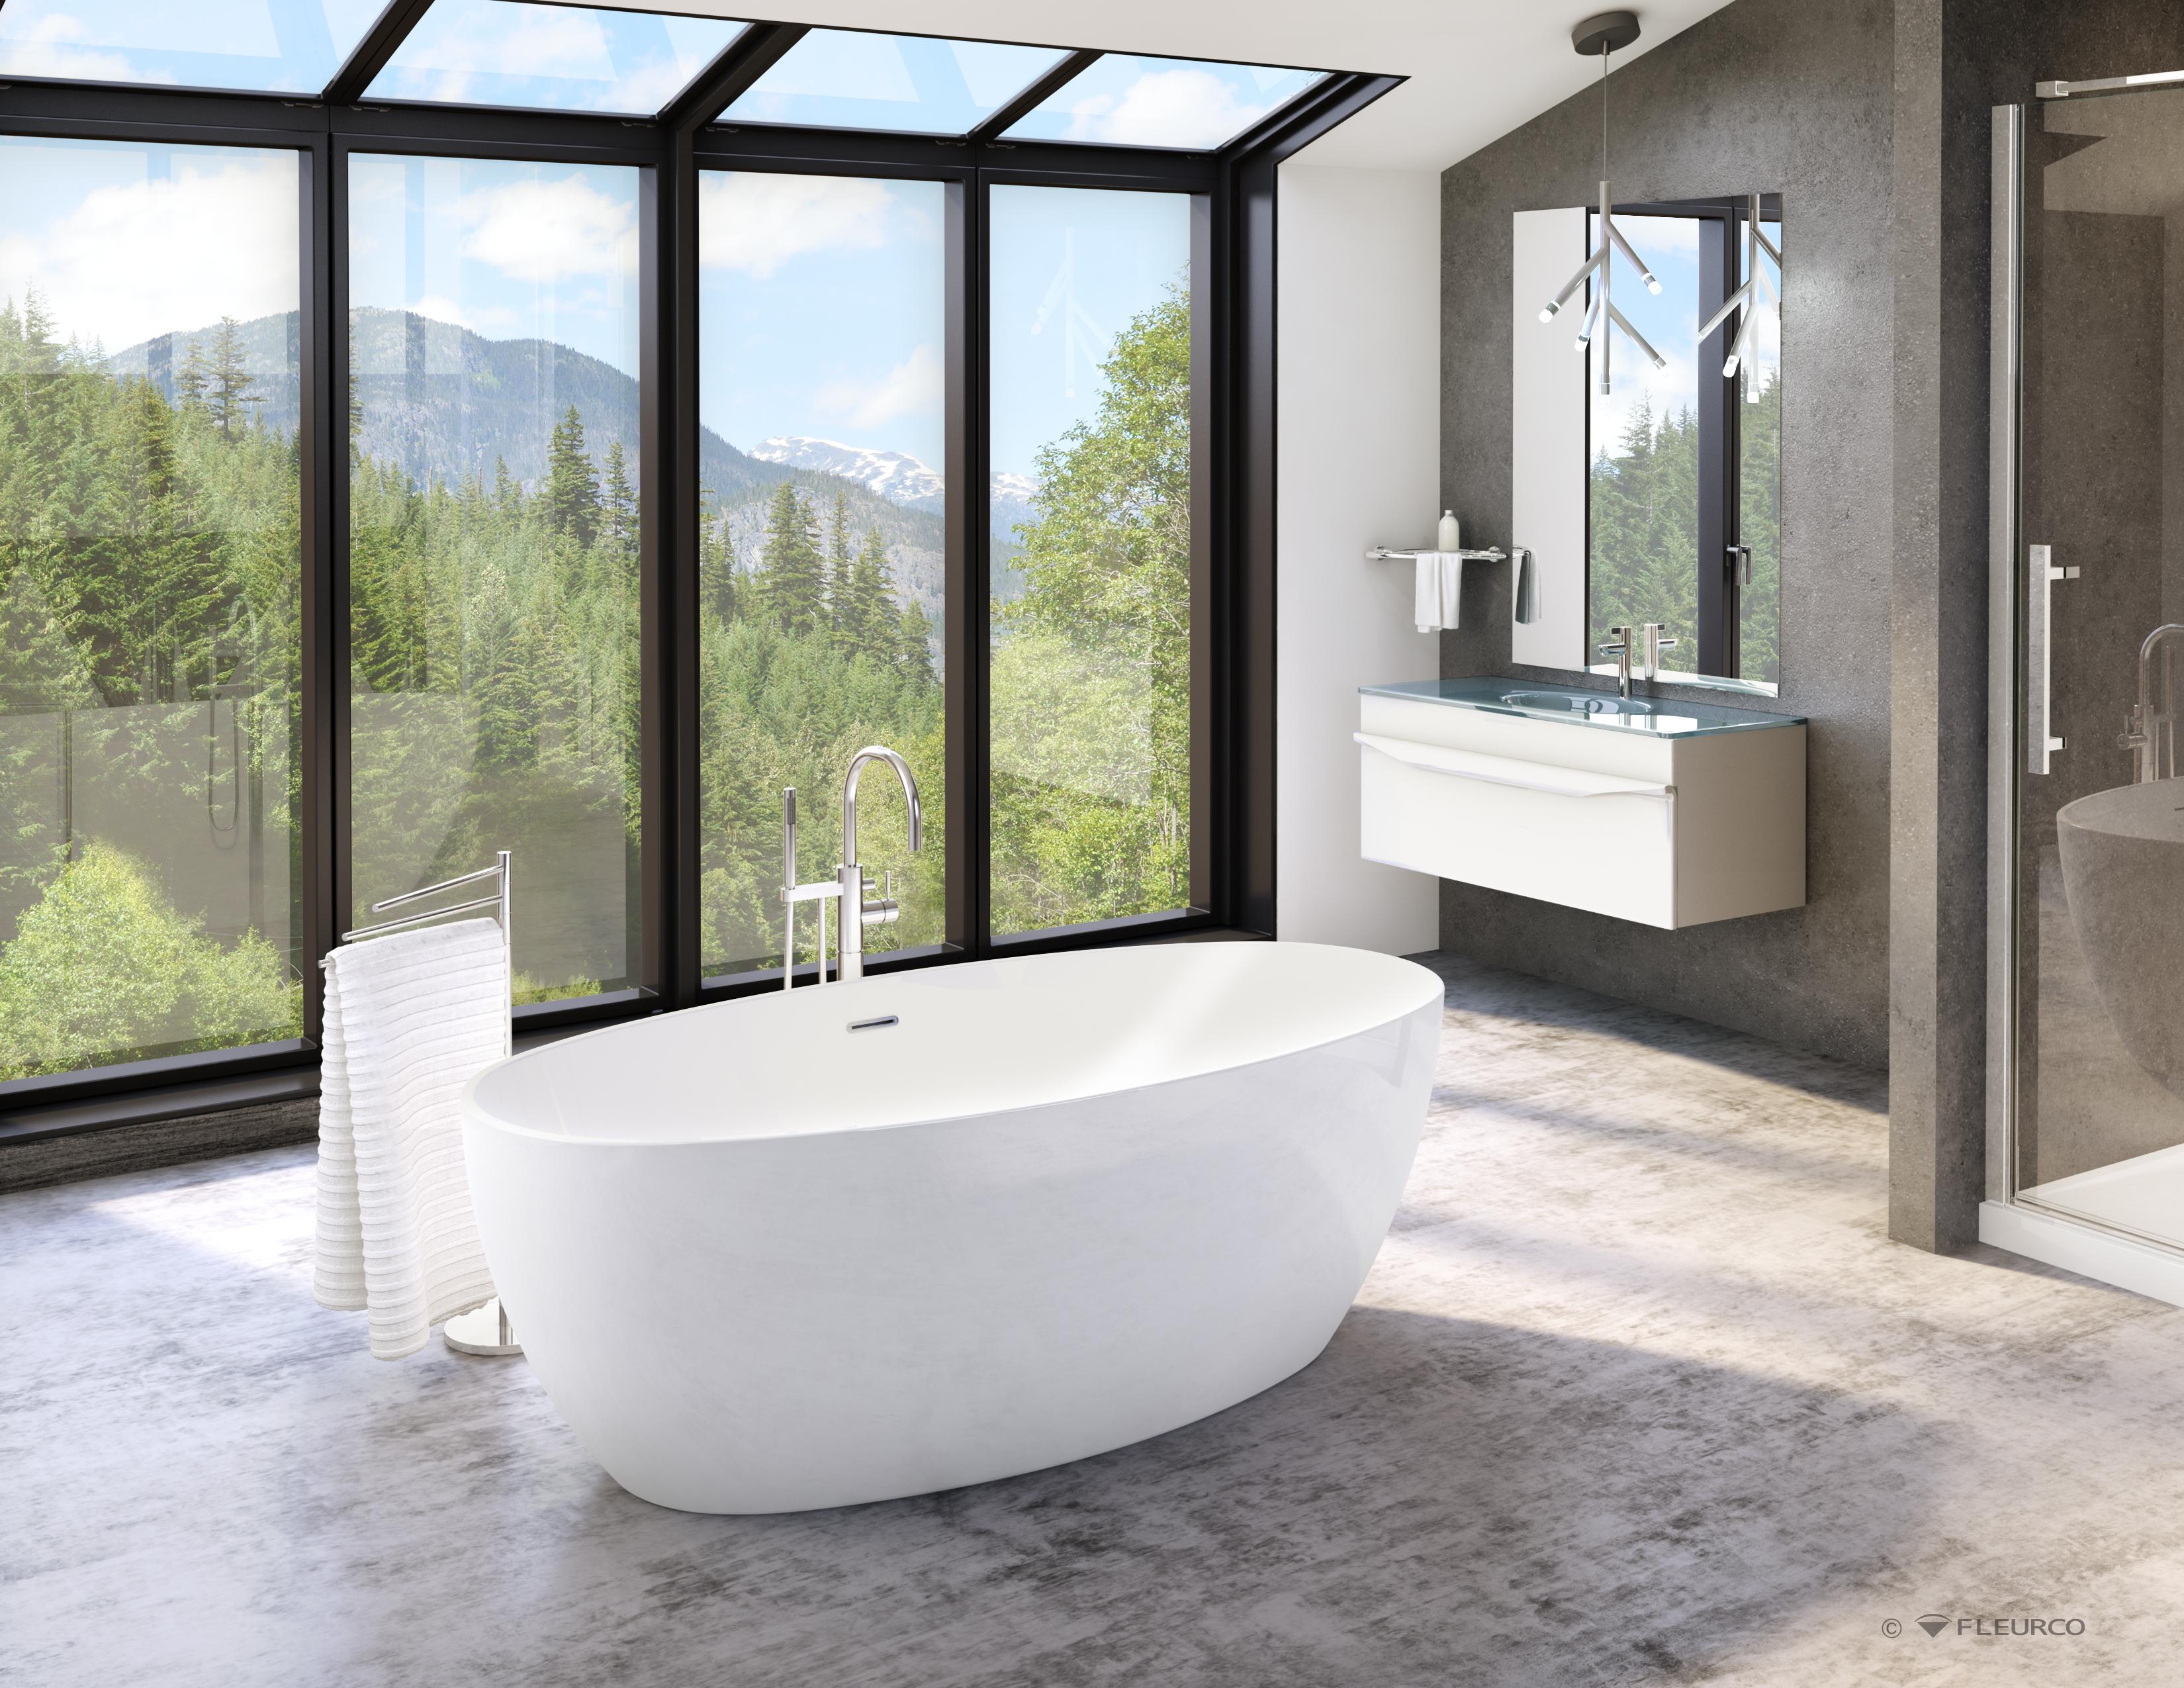 Fleurco Voce Freestanding Tub Dynasty Bathrooms